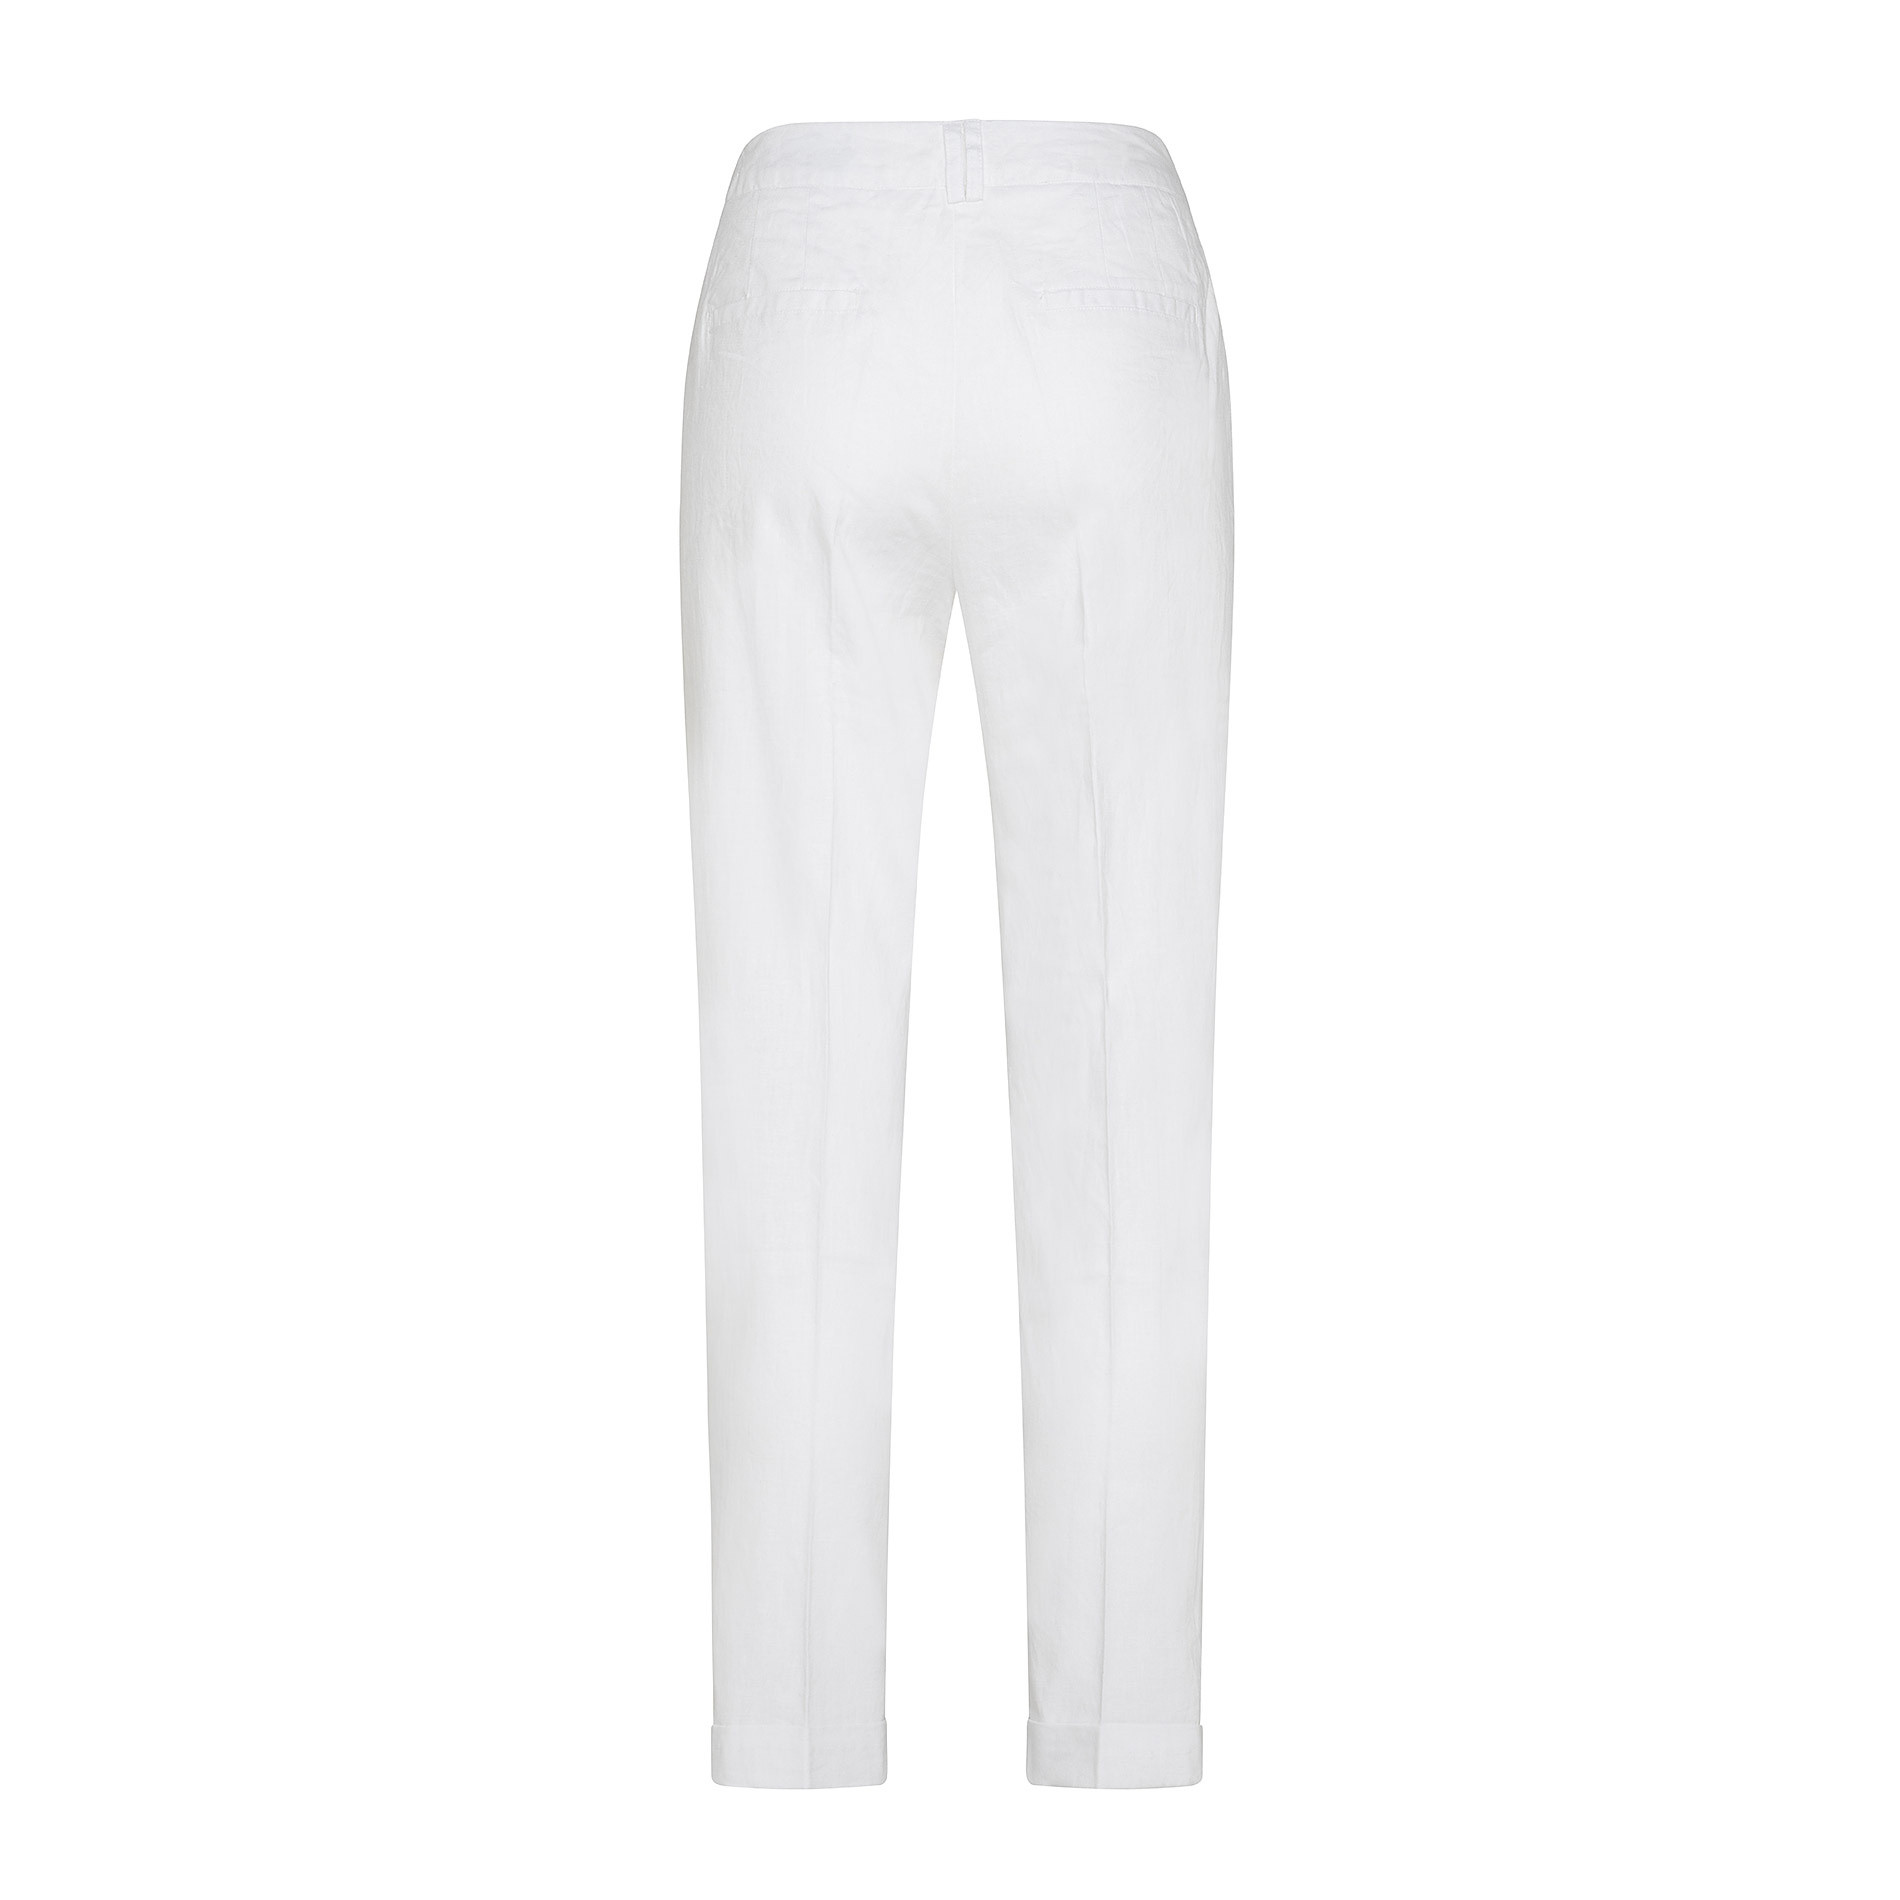 Pantalone classico in misto lino Koan, Bianco, large image number 1